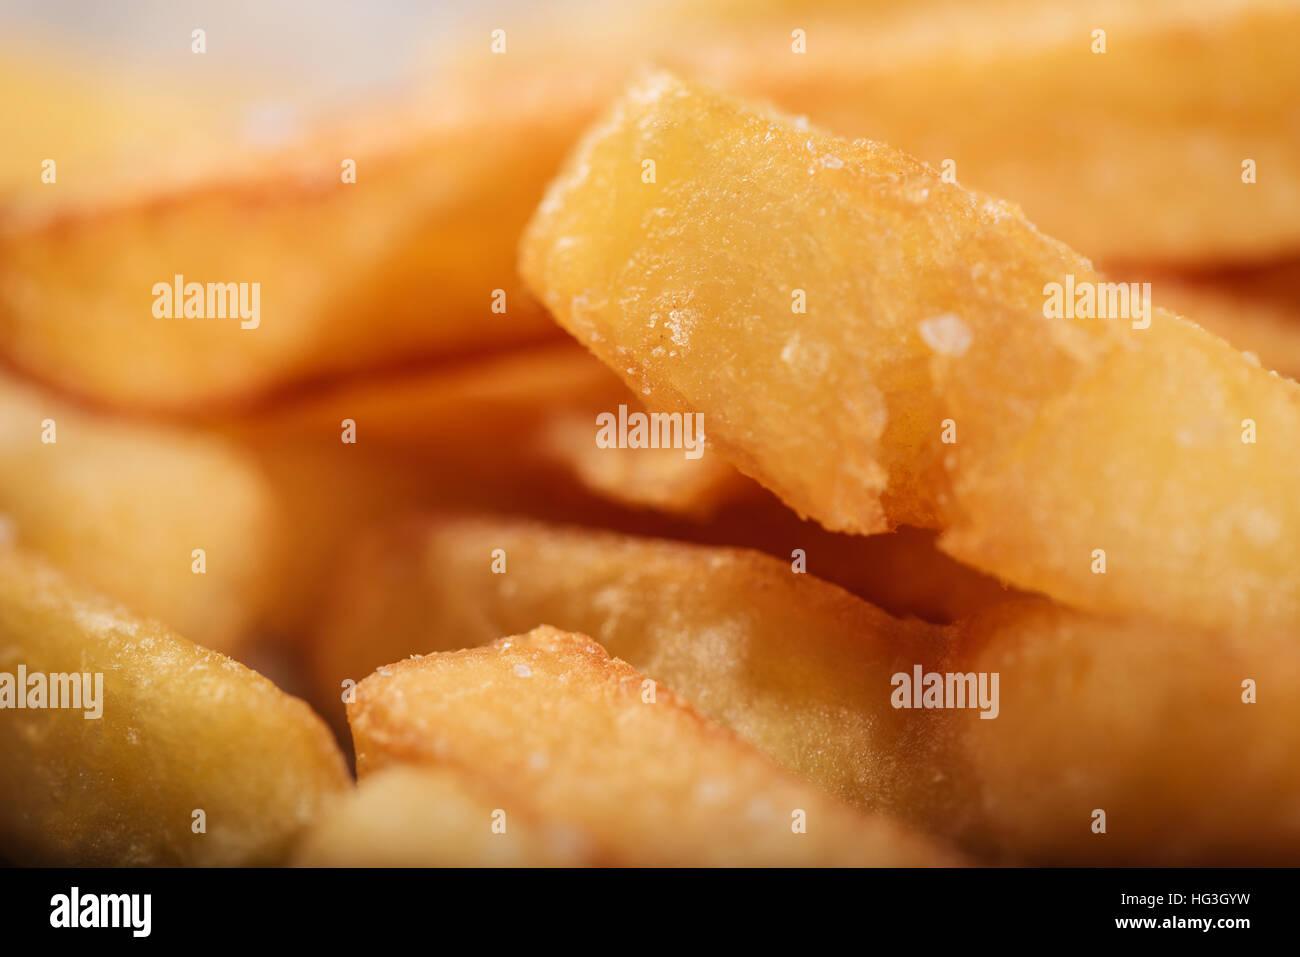 Nahaufnahme von leckeren Pommes frites Stockbild